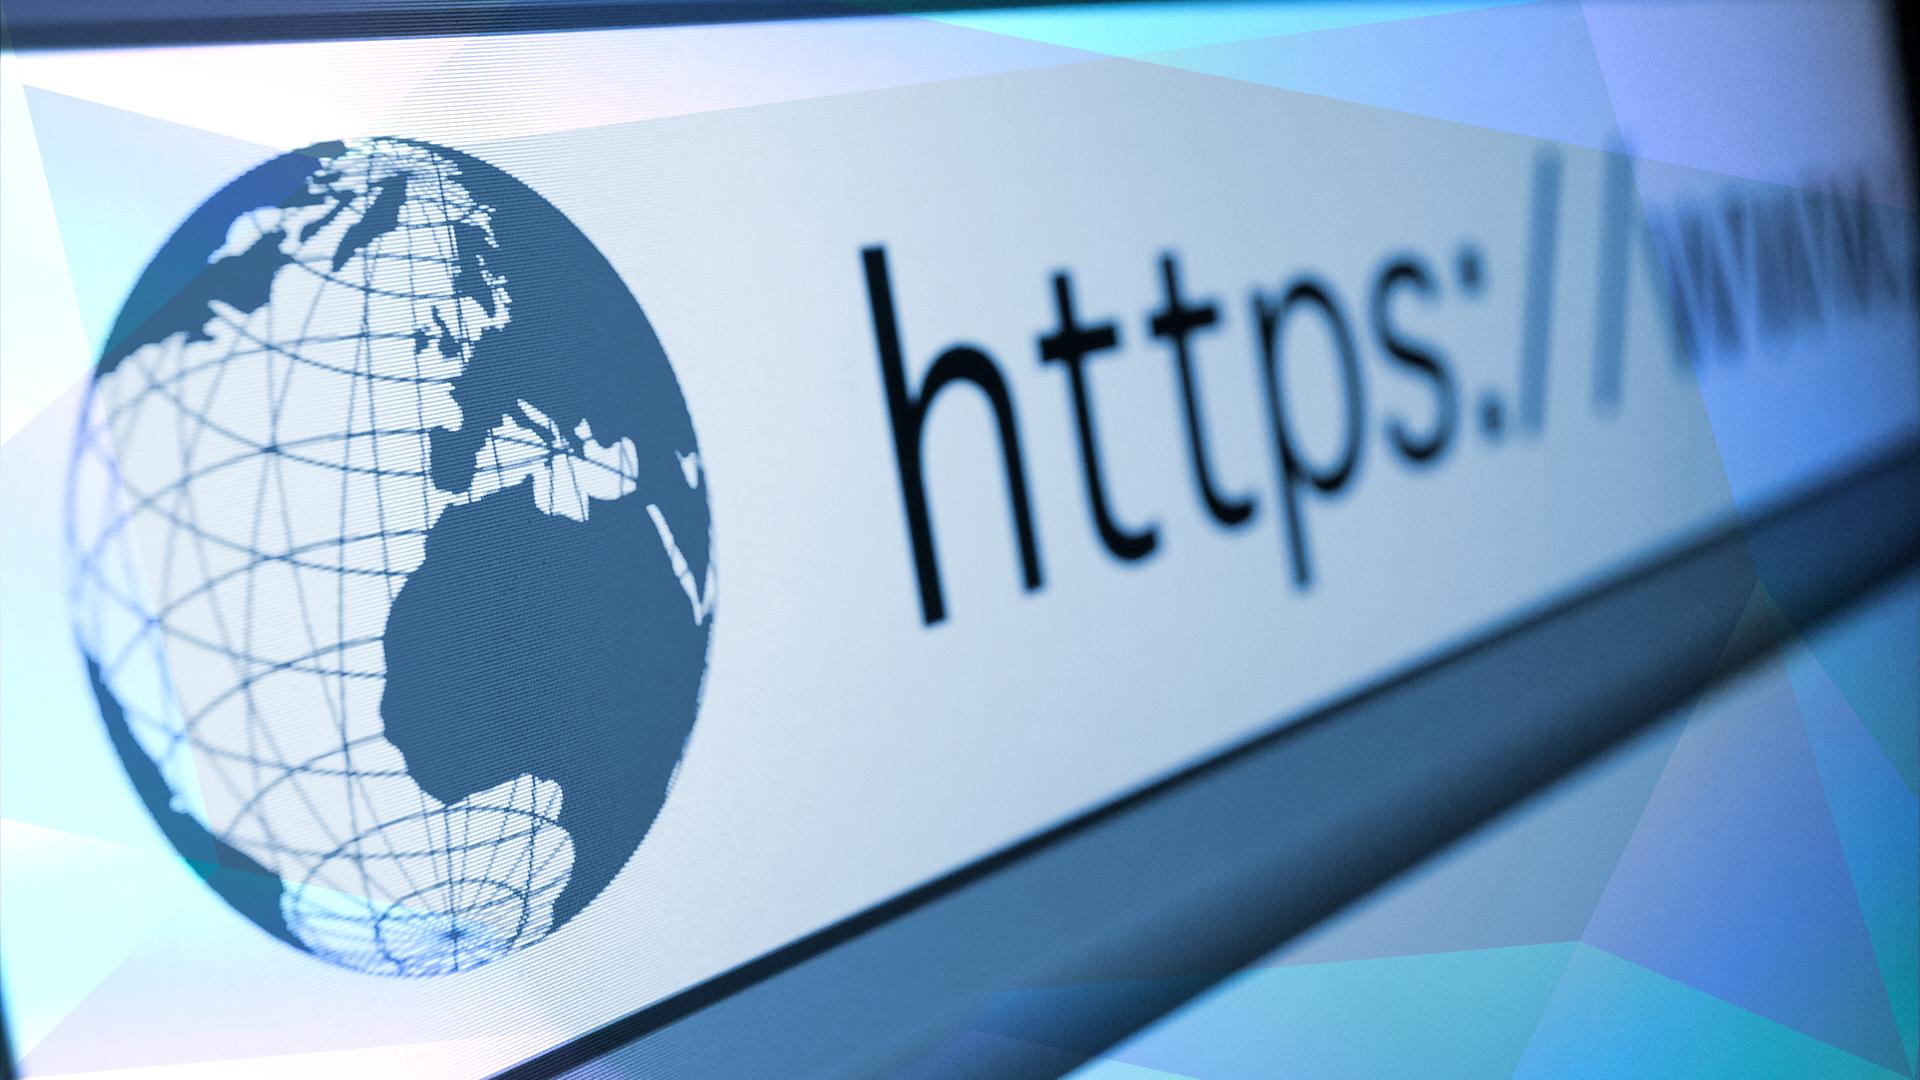 Internet, Browser, Stockfotos, Https, WWW, HTTP, URL, World Wide Web, URL-Leiste